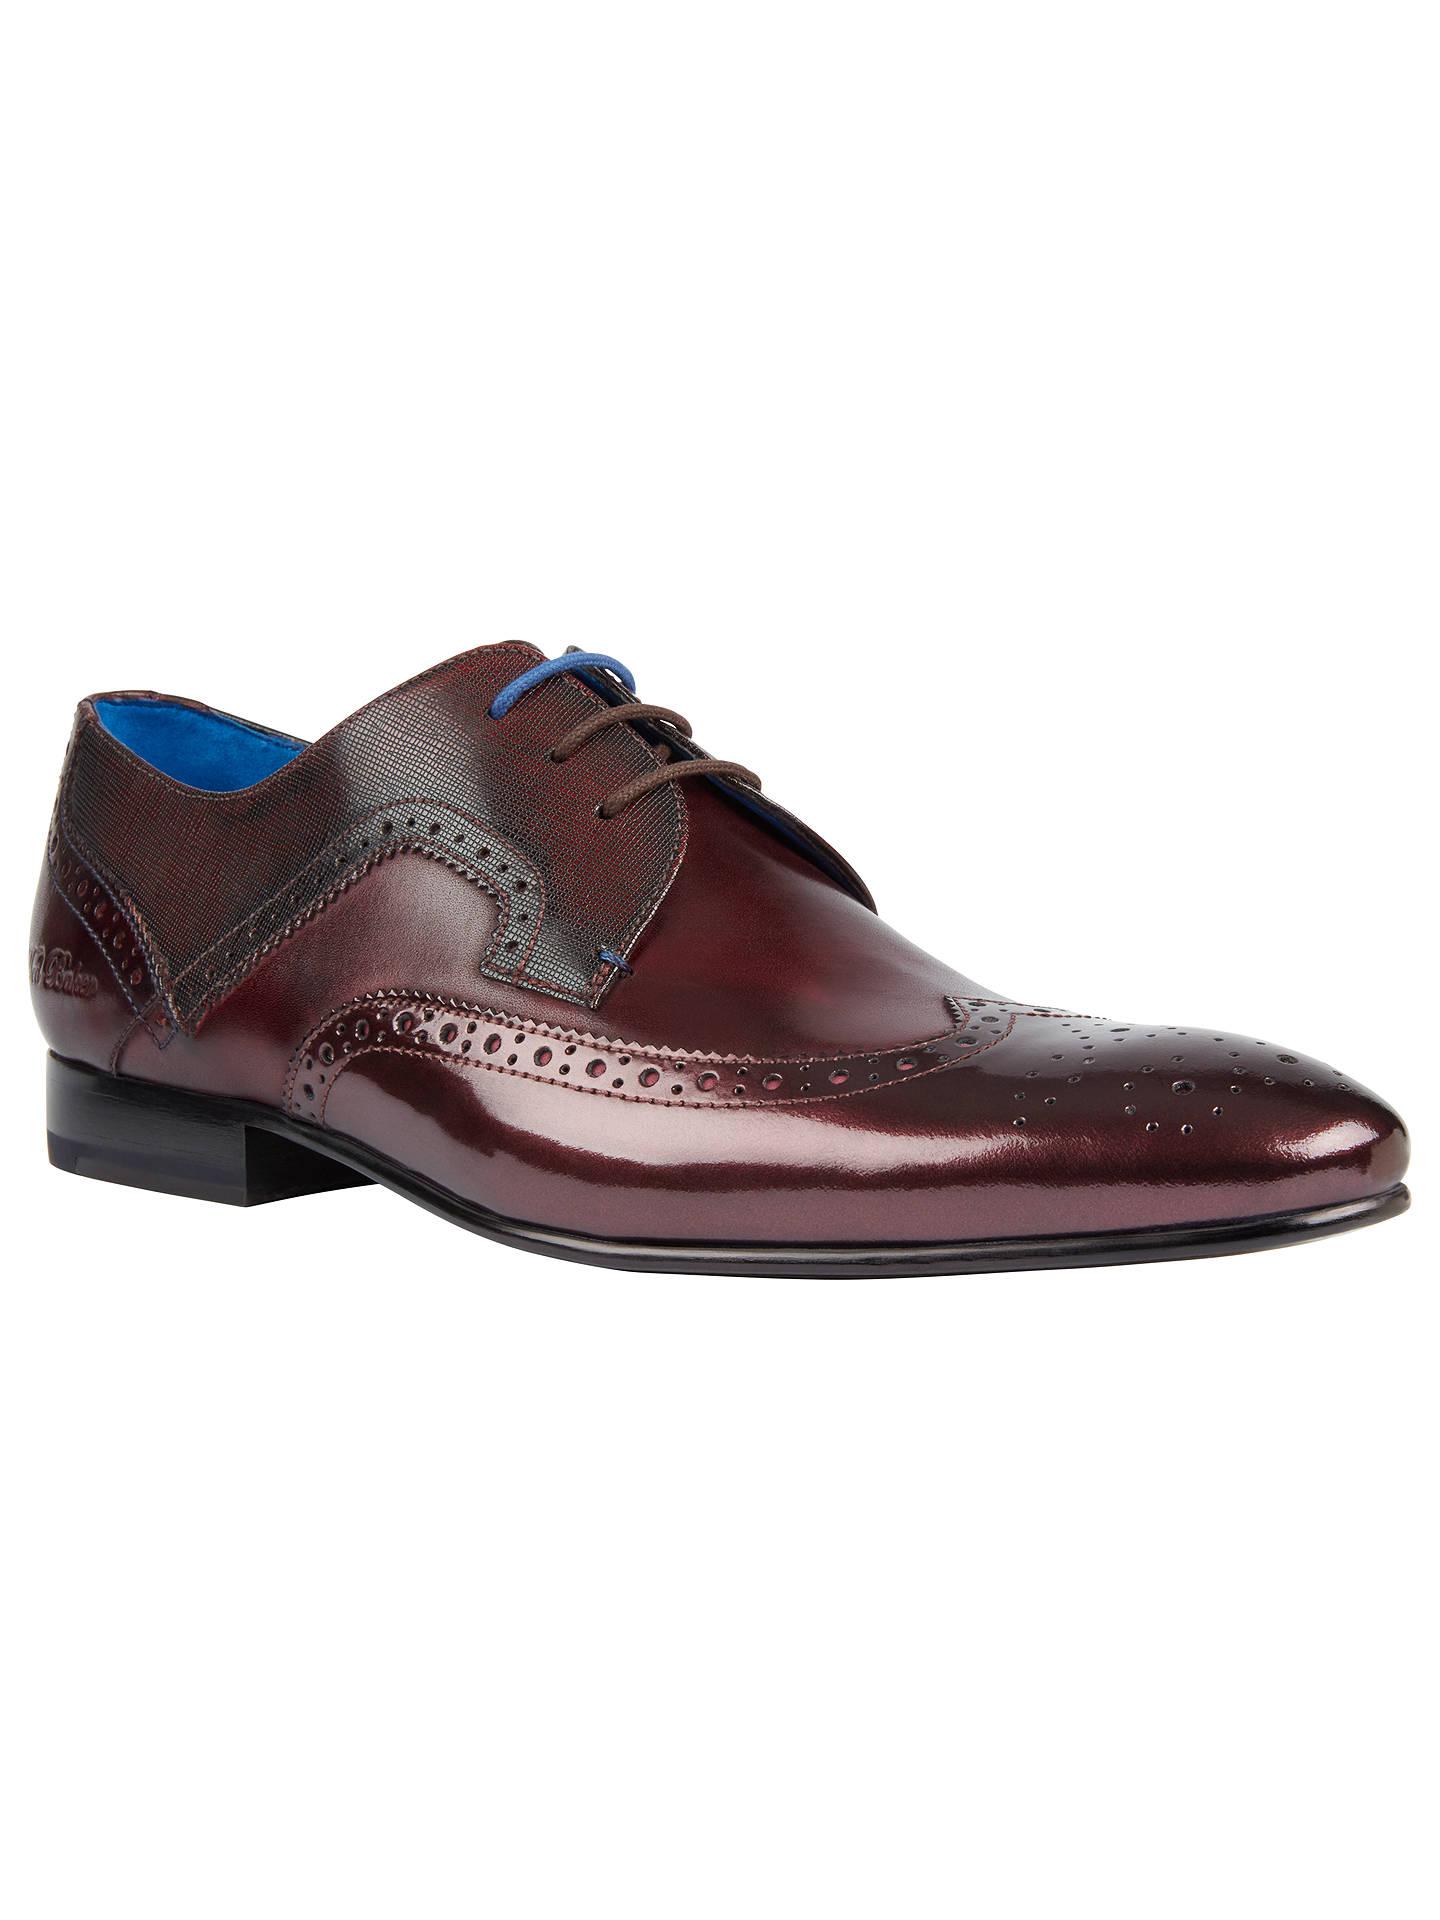 7e9104470 Ted Baker Oakke Derby Brogue Shoes at John Lewis   Partners